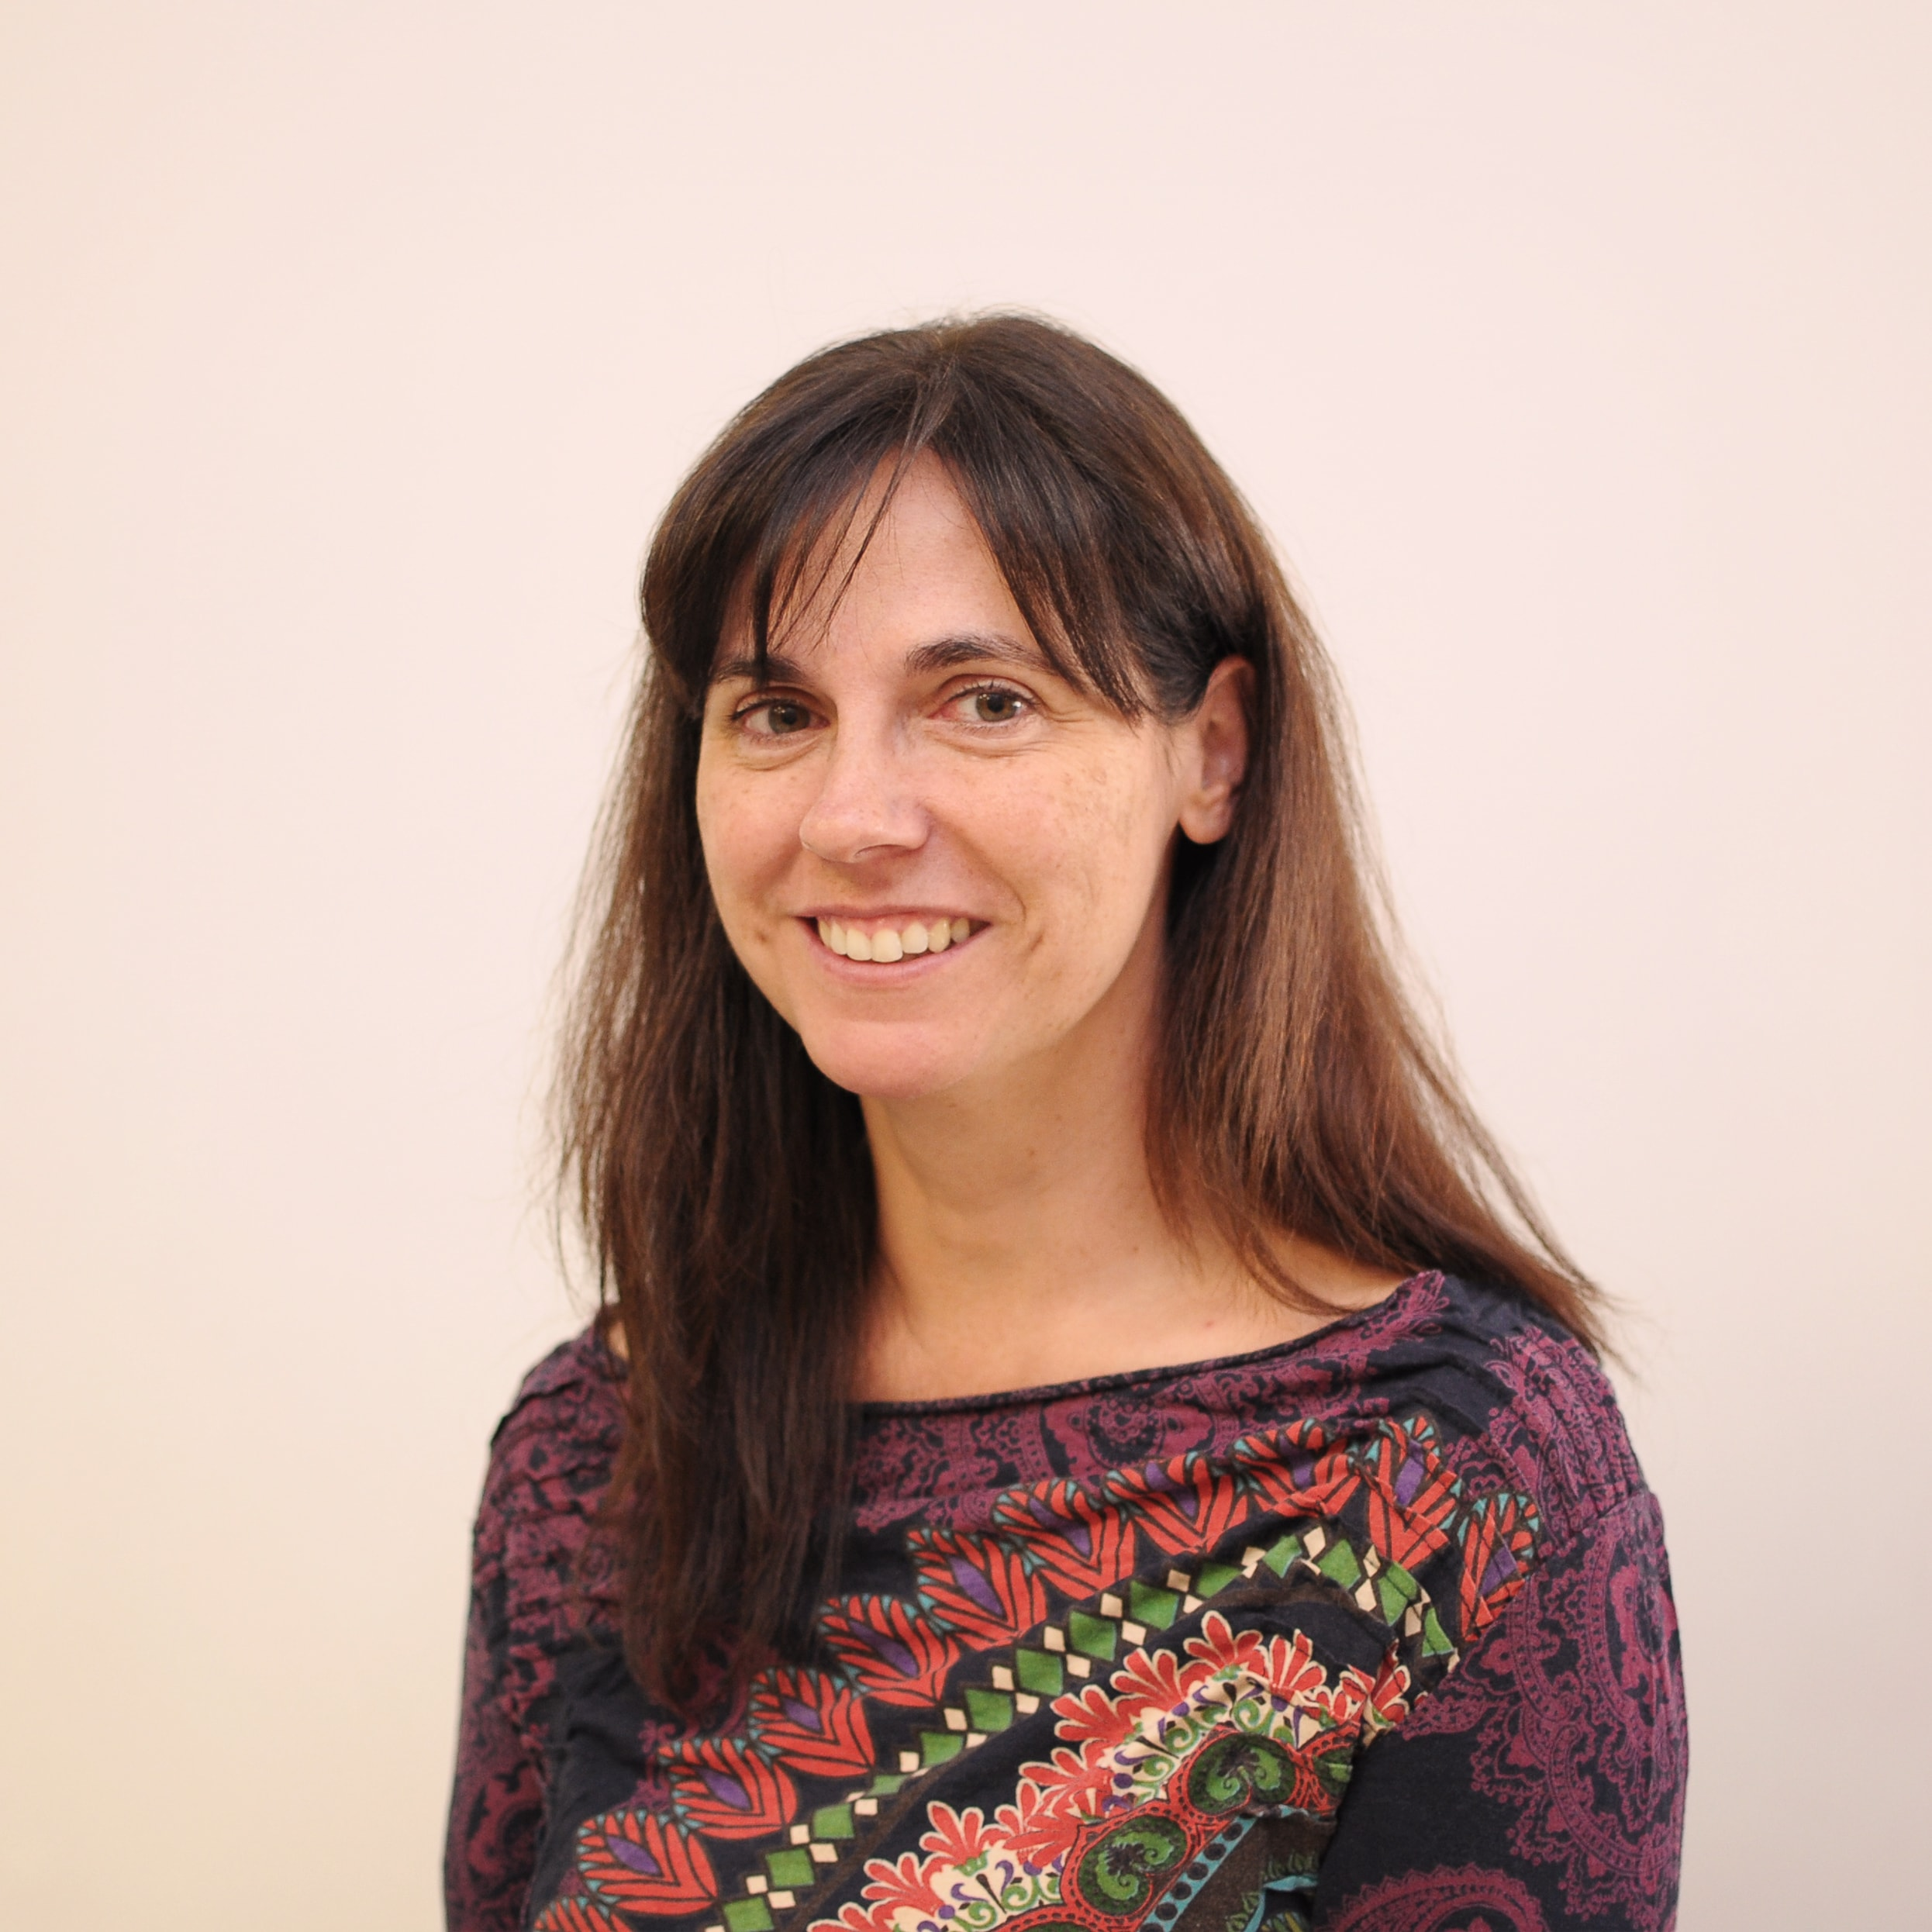 Elena Pelayo